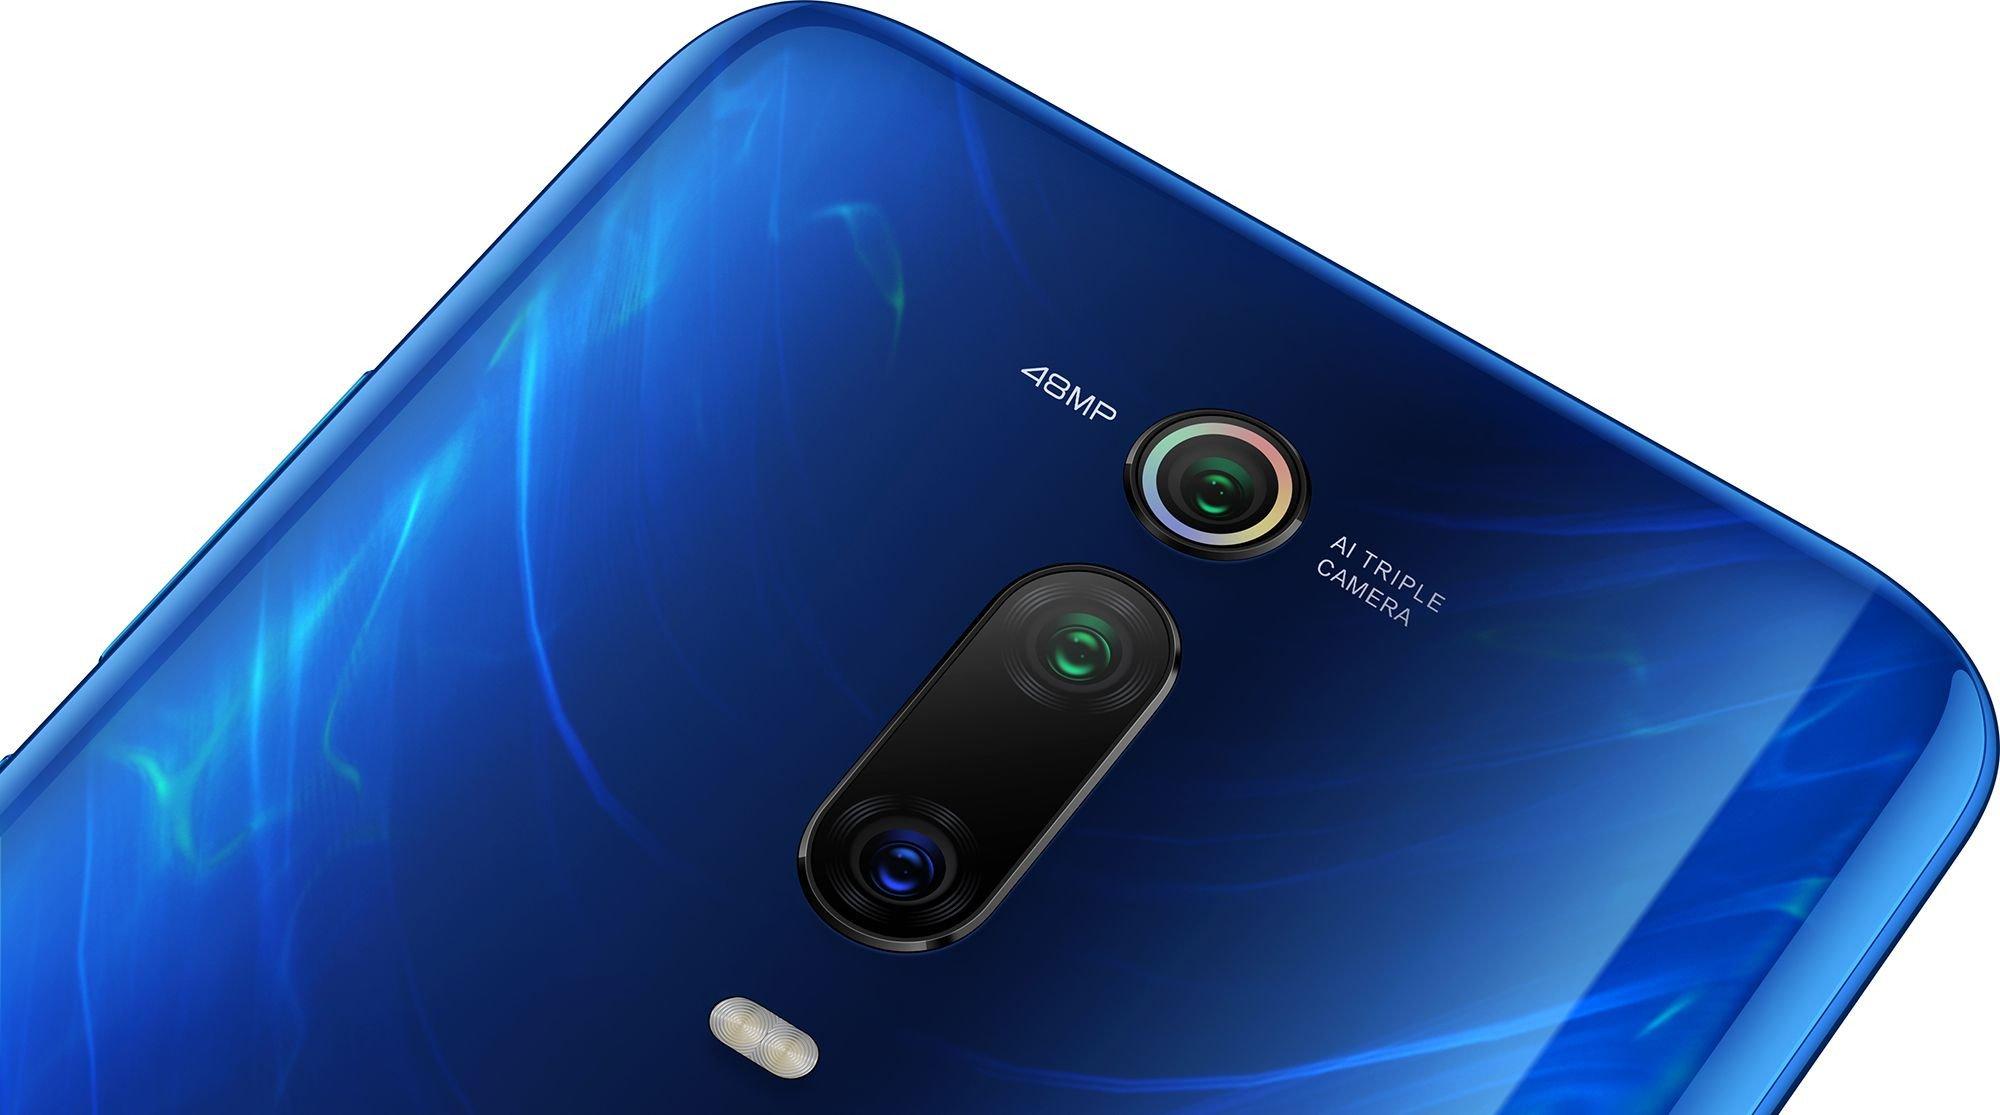 7 смартфонов флагманов 2019 года - Xiaomi Mi 9T pro камера